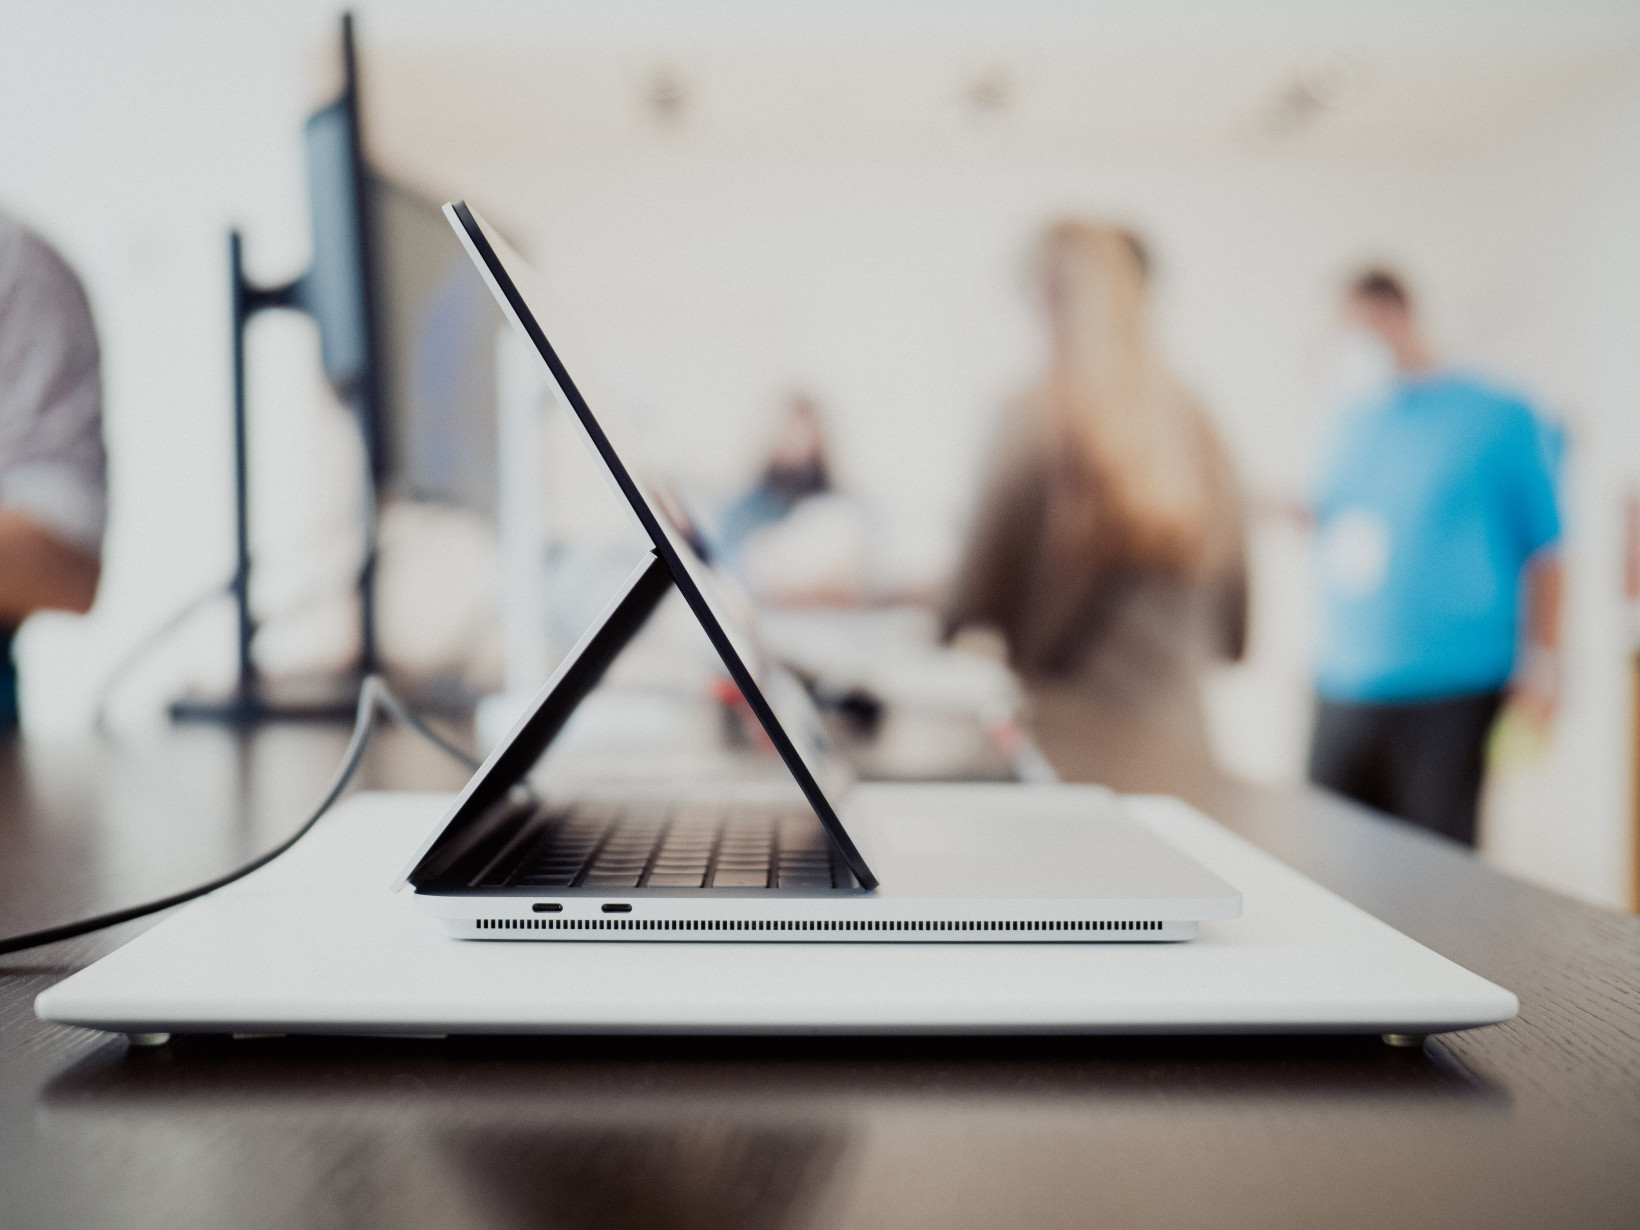 Surface Laptop Studio side view